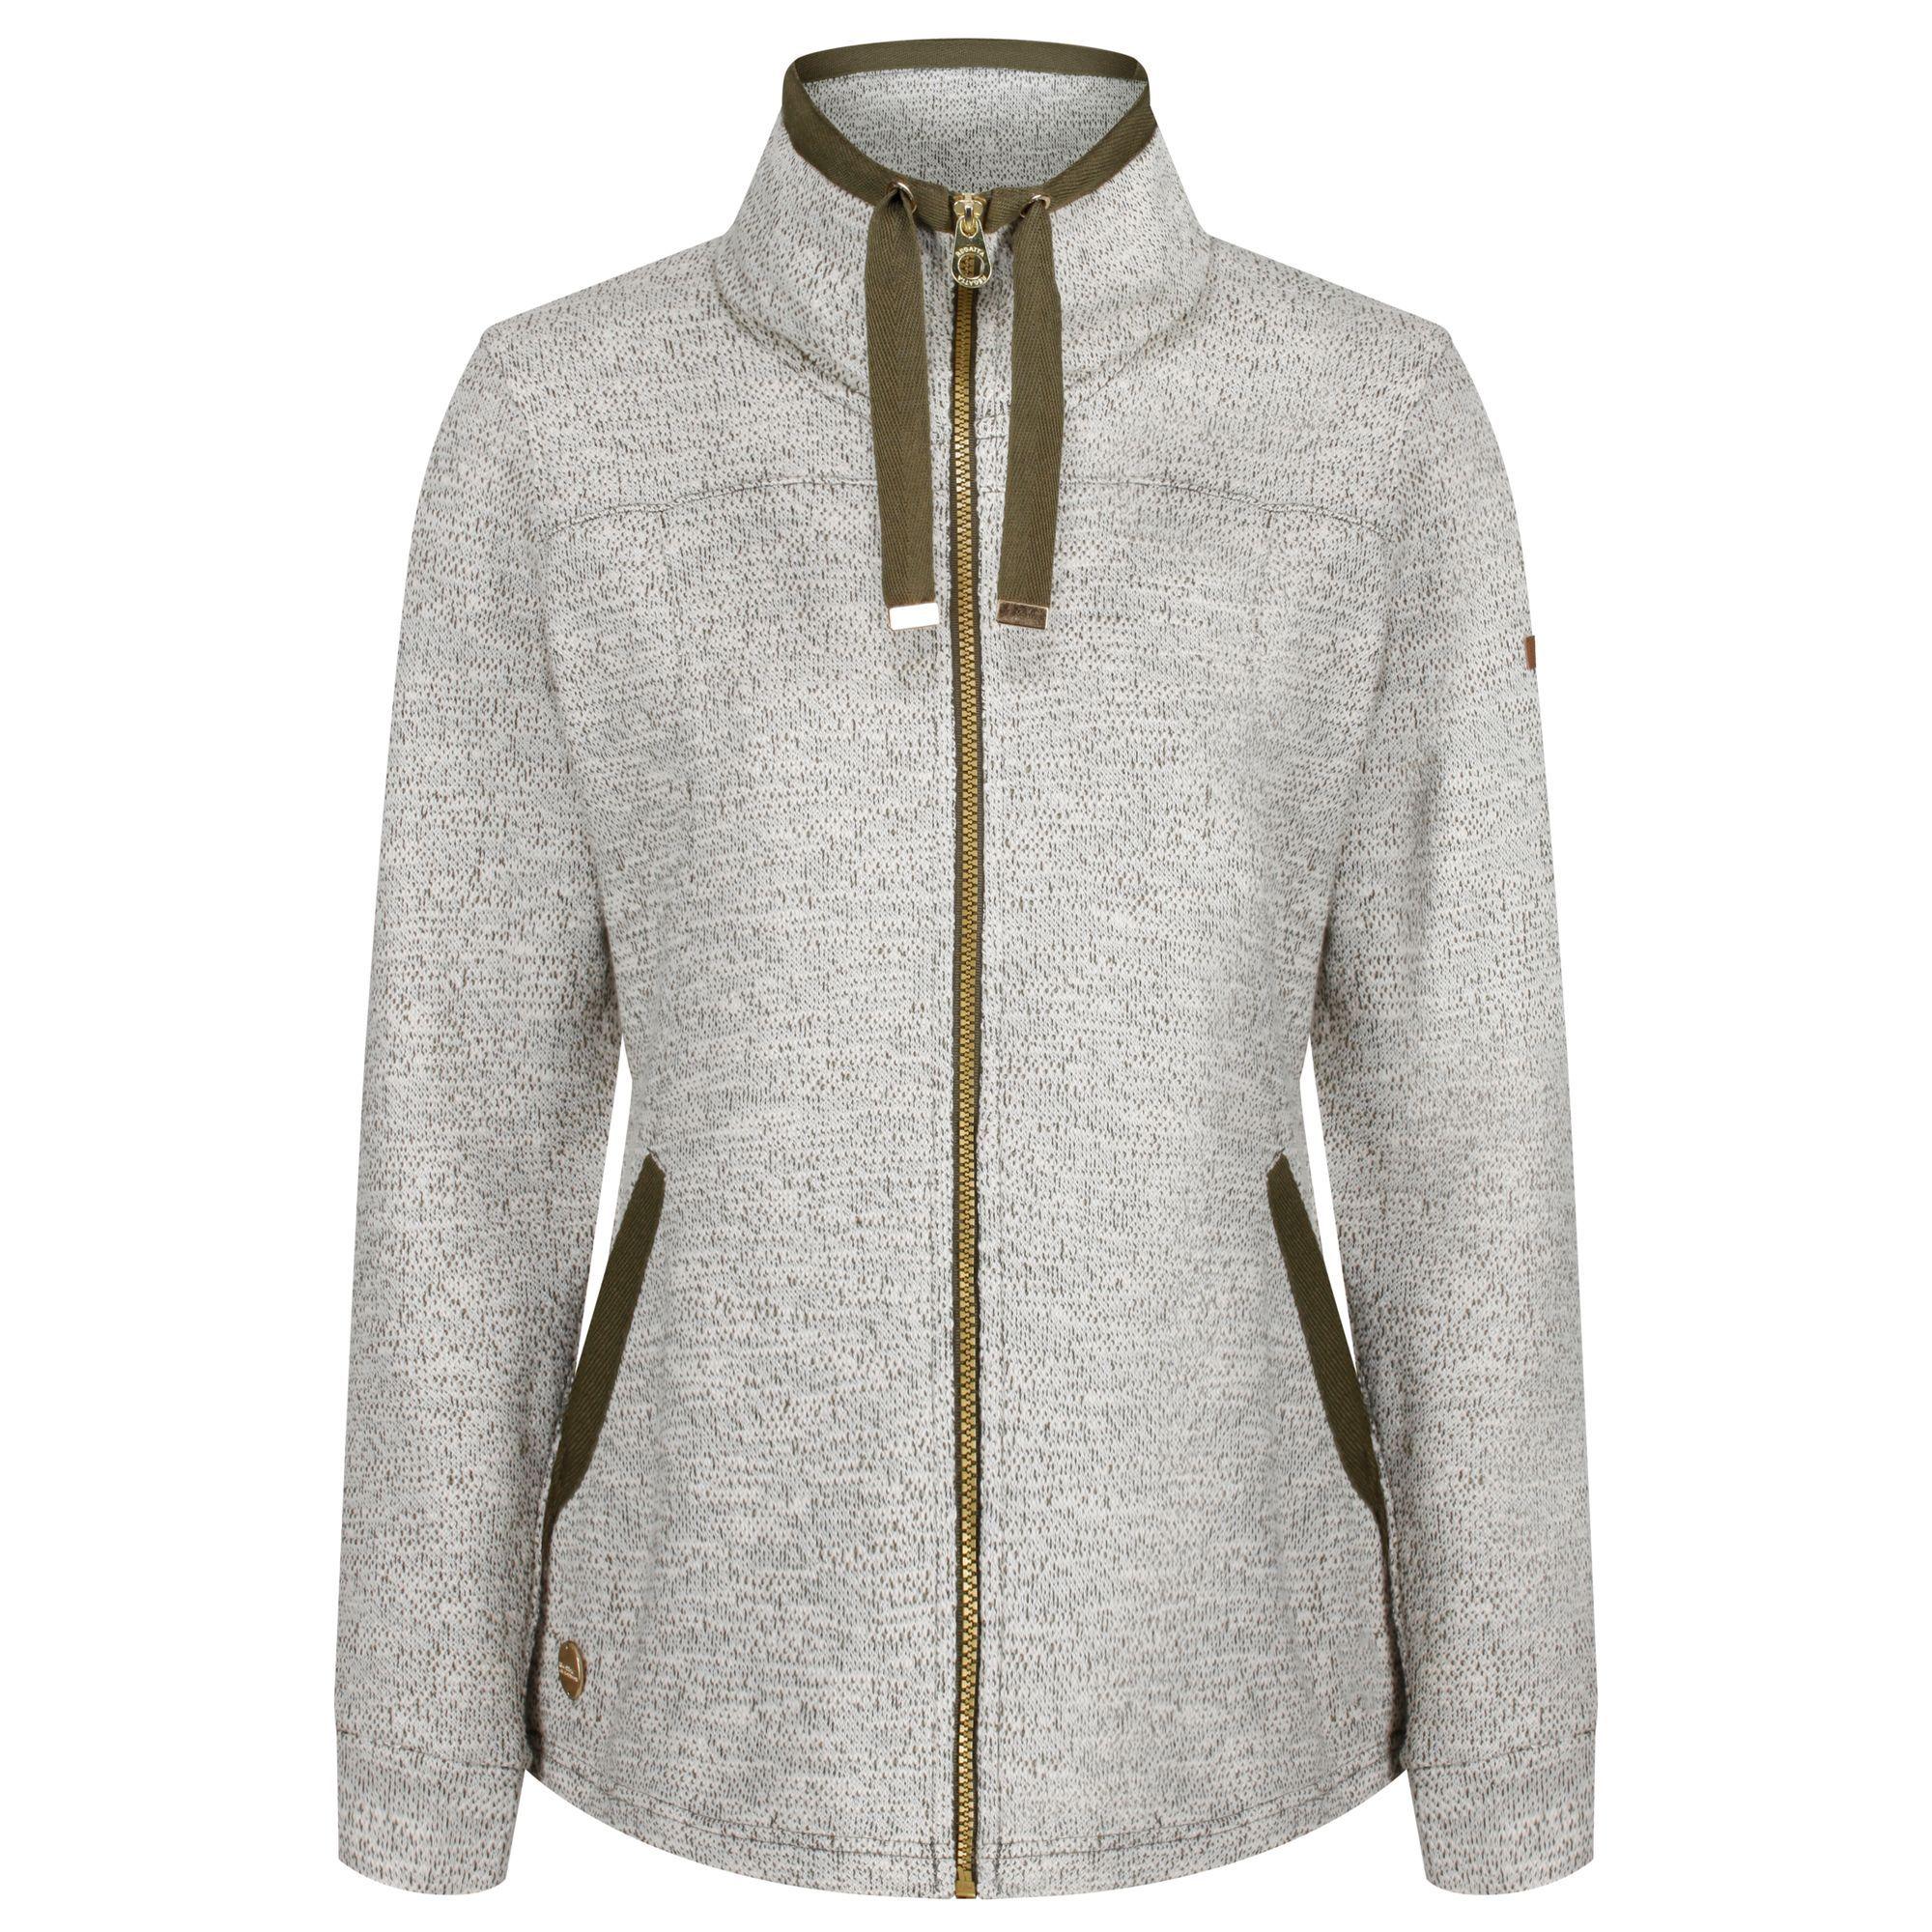 Regatta-Odetta-Womens-Warm-Curved-Full-Zip-Fleece-Jacket-RRP-50 thumbnail 8